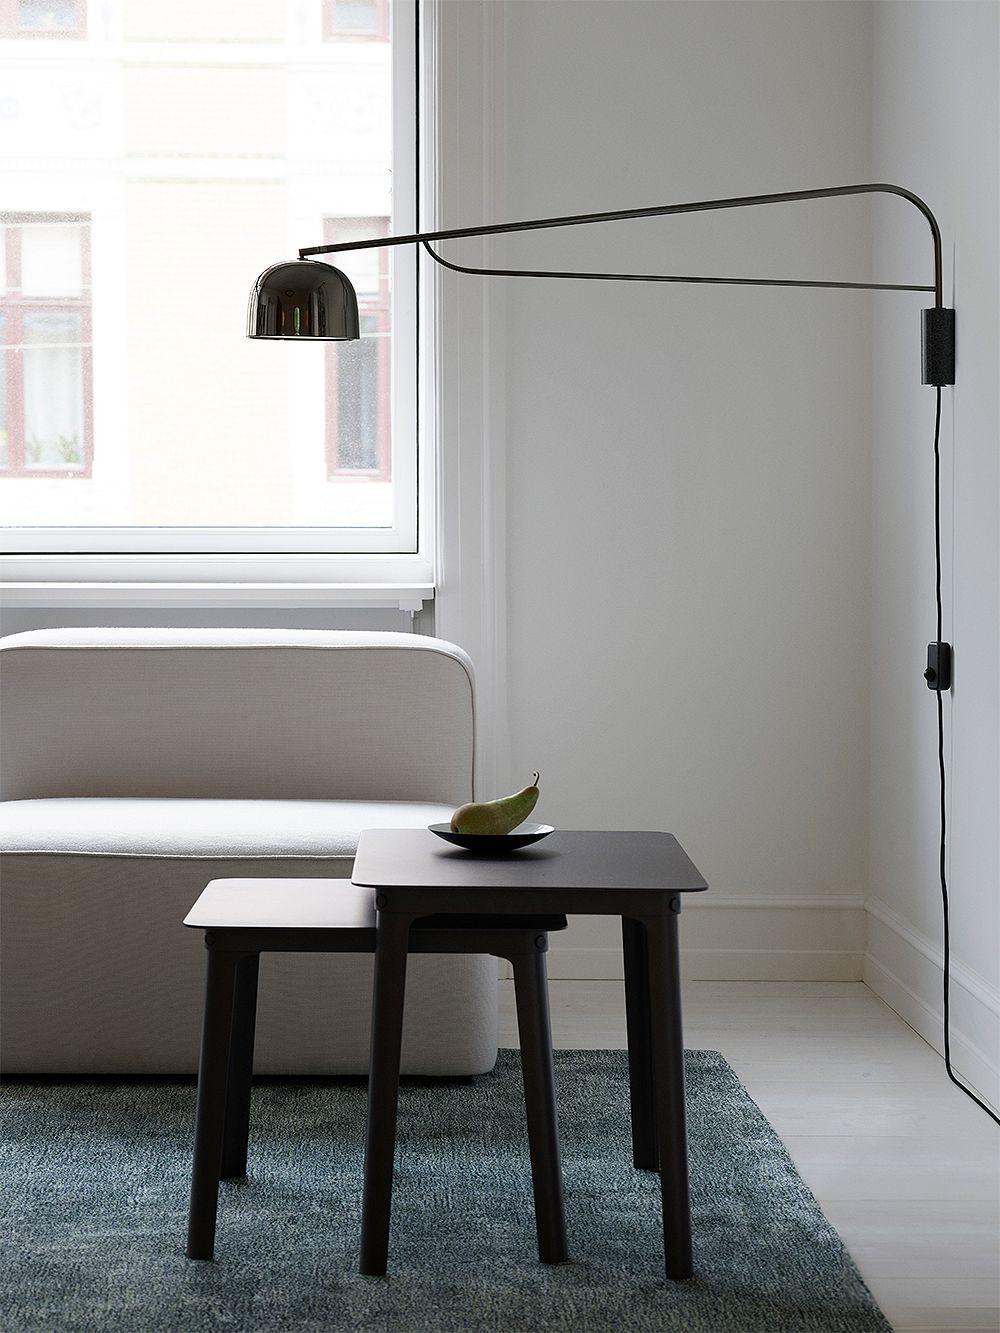 Normann Copenhagen  Grant wall lamp 111 cm, black